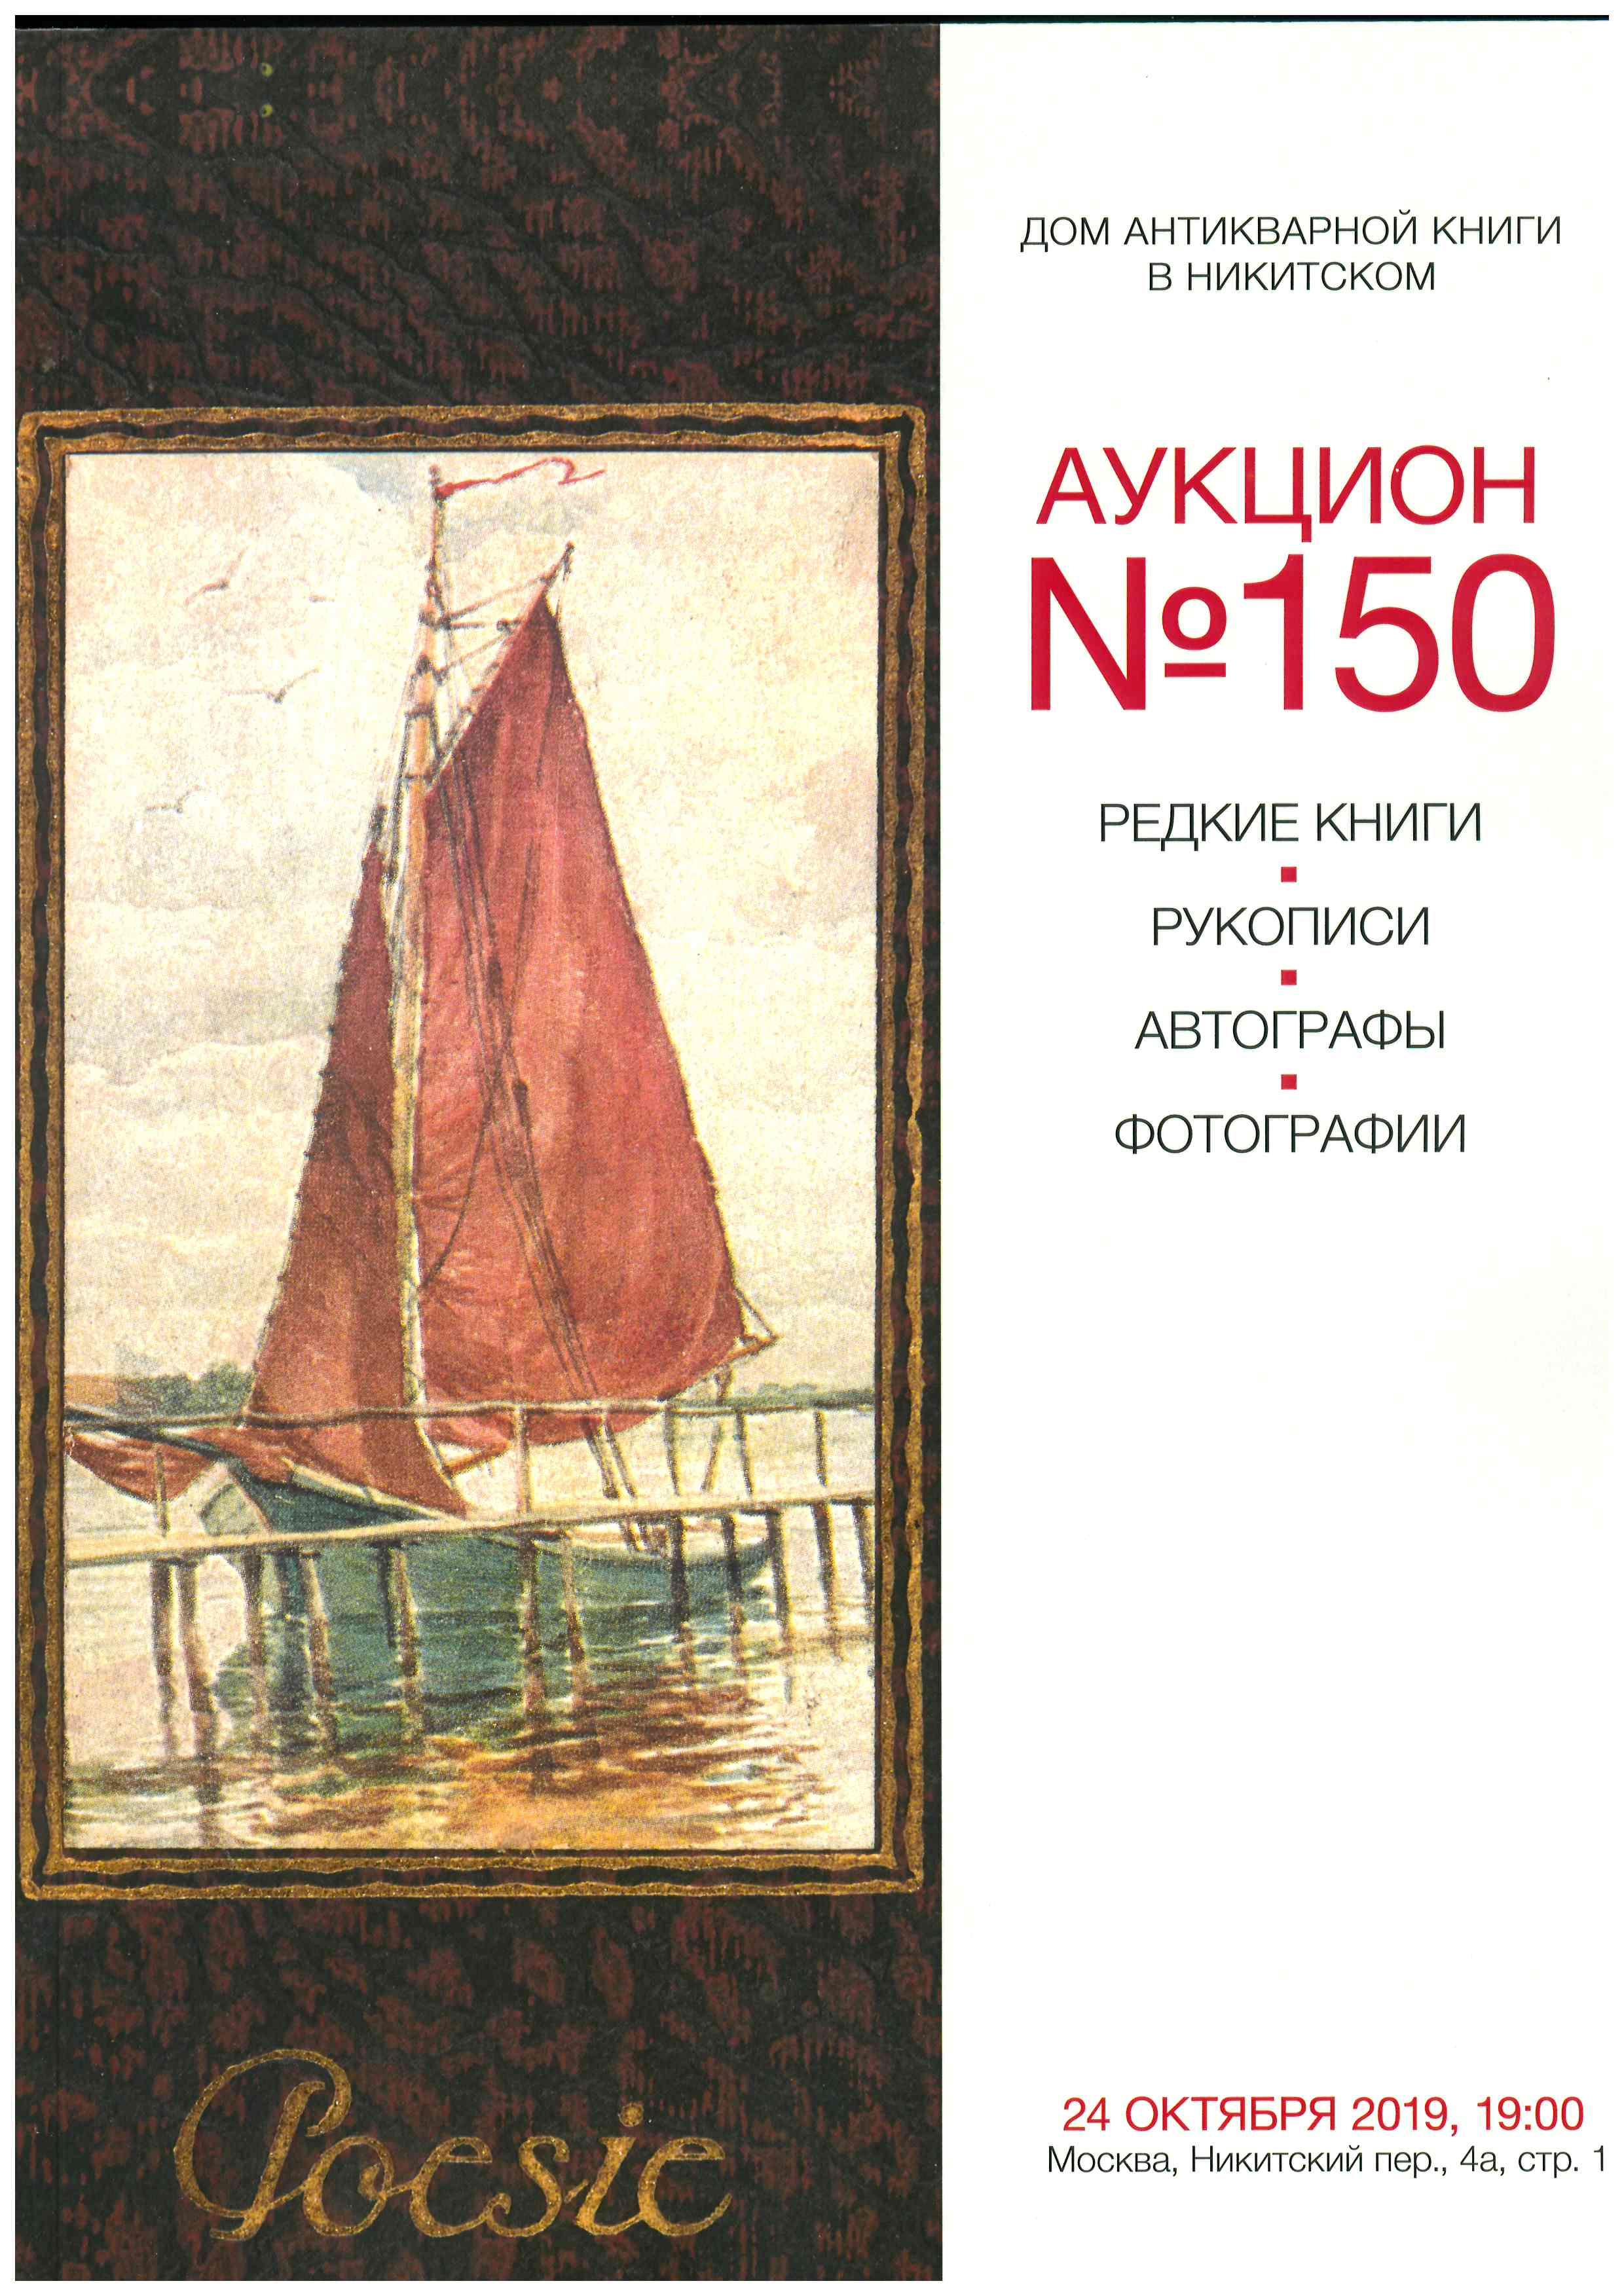 Каталог аукциона № 150